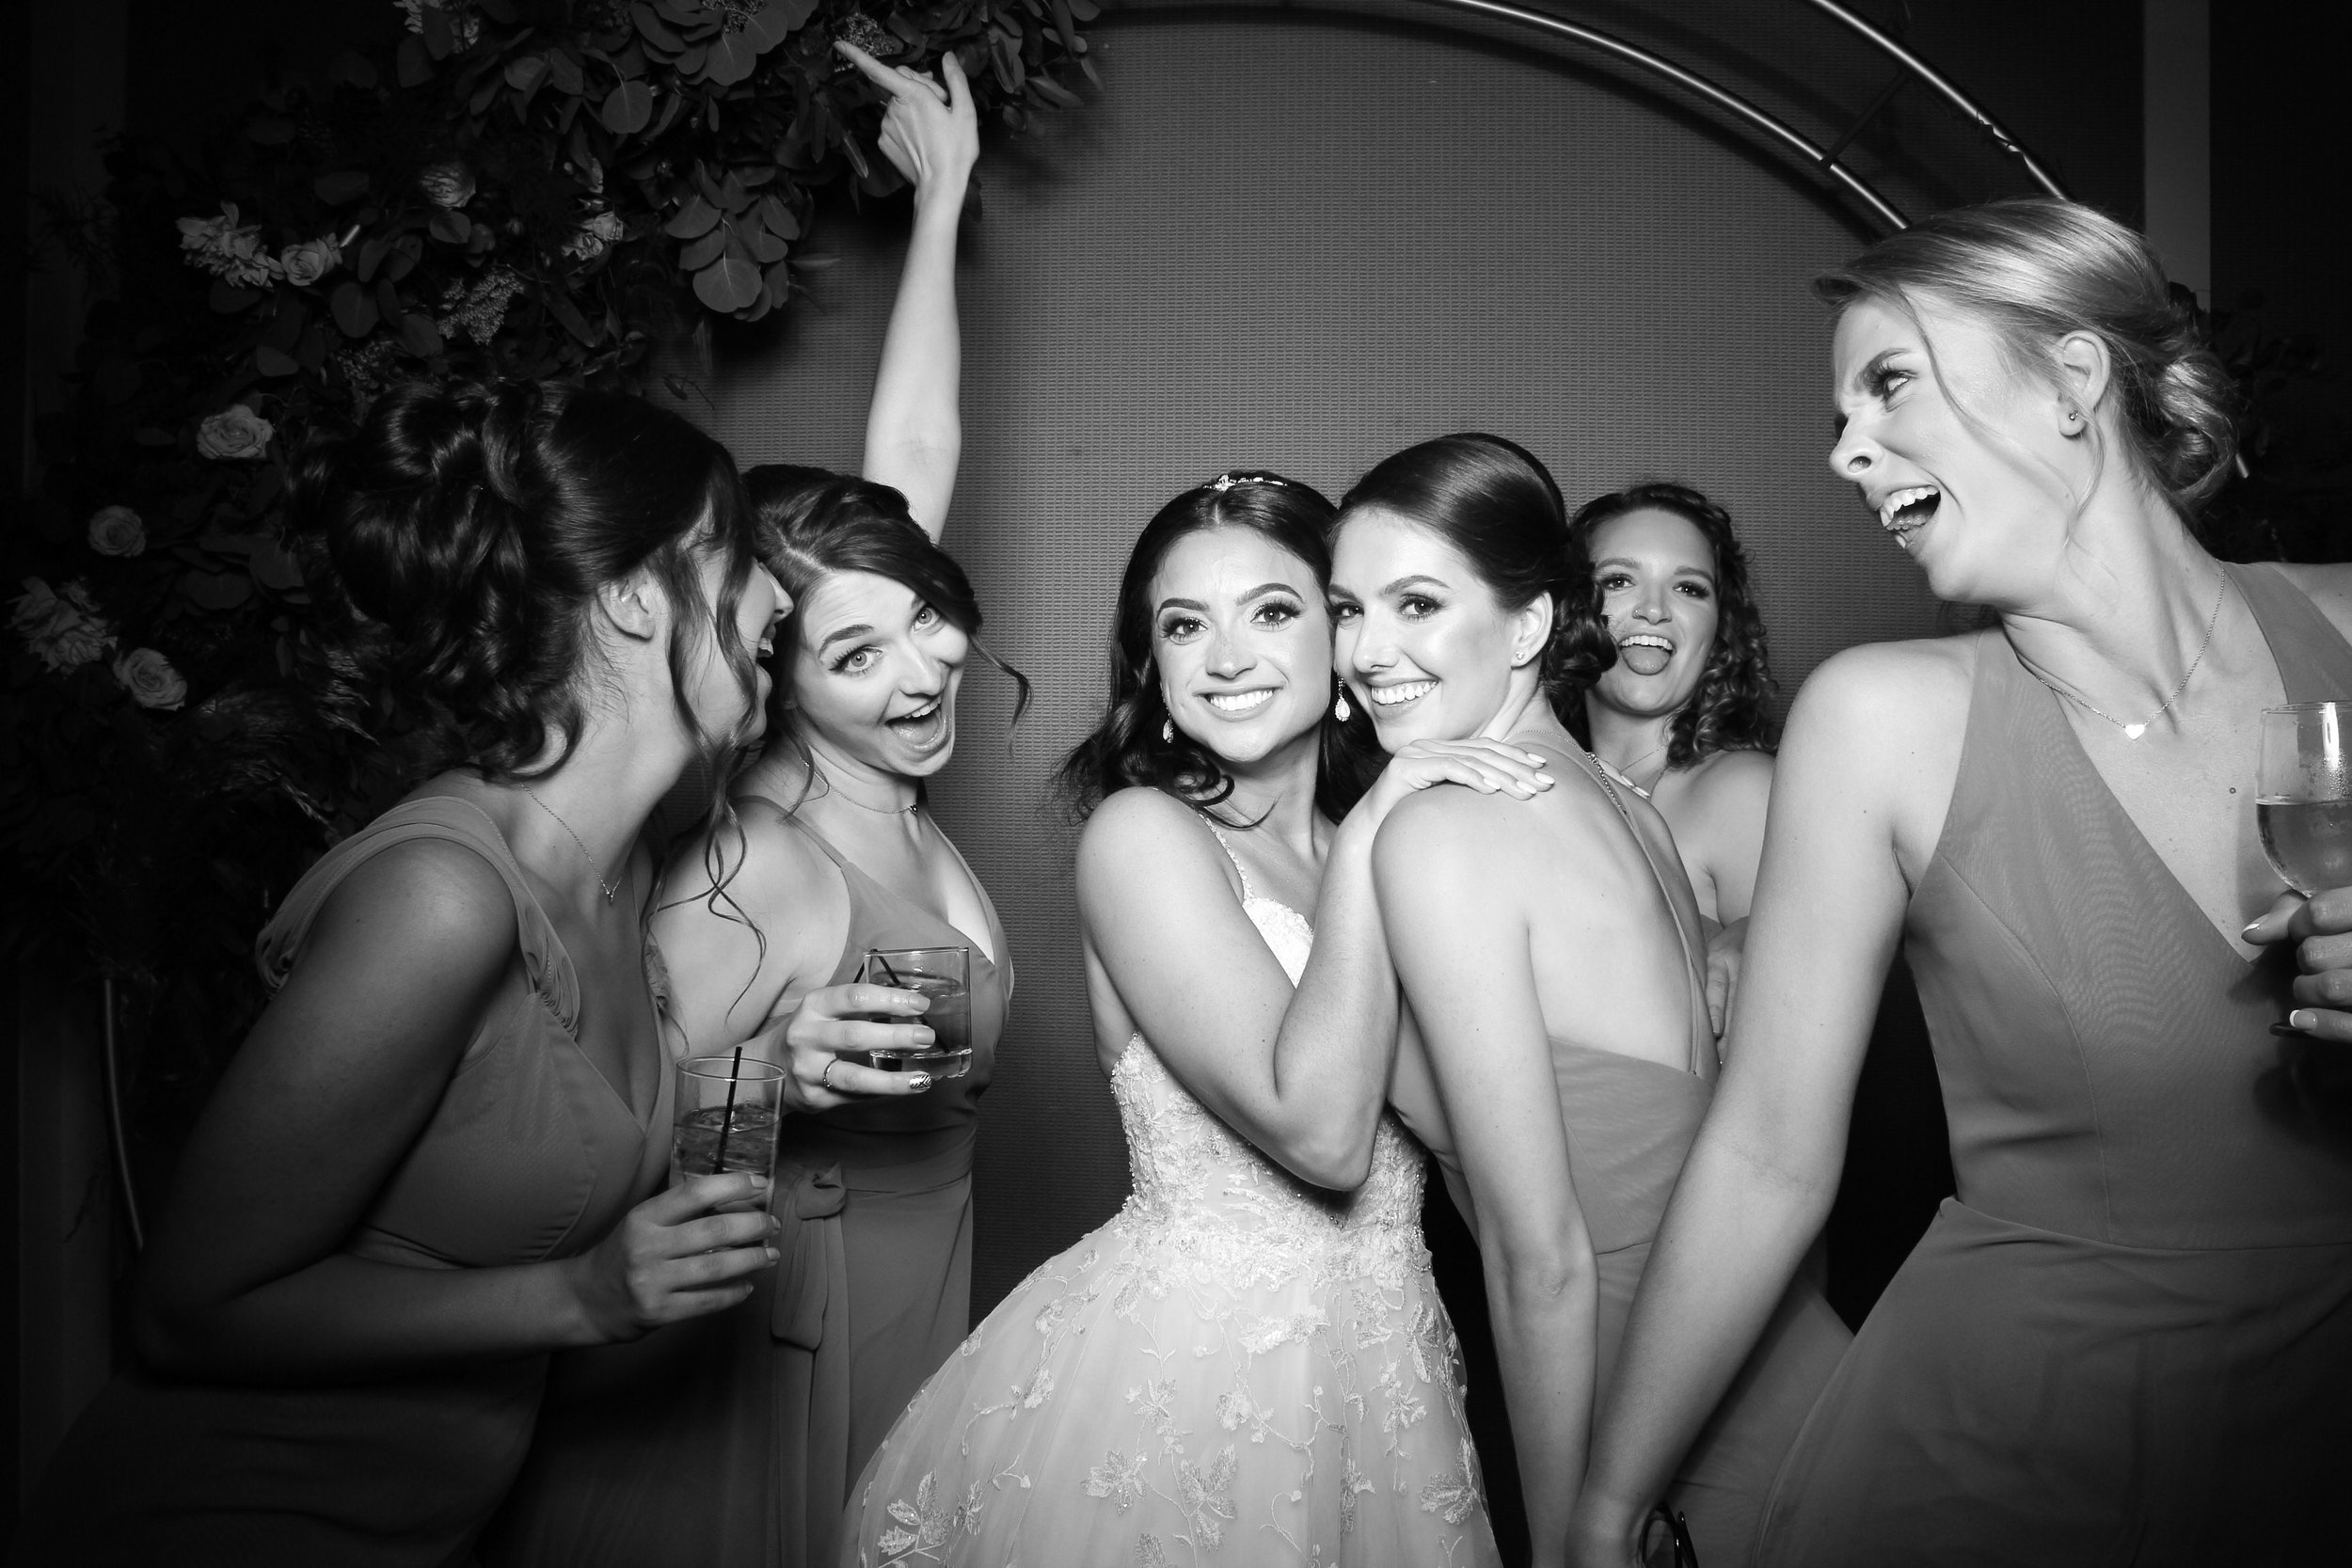 Metropolis_Ballroom_Wedding_Arlington_Heights_Photo_Booth_11.jpg